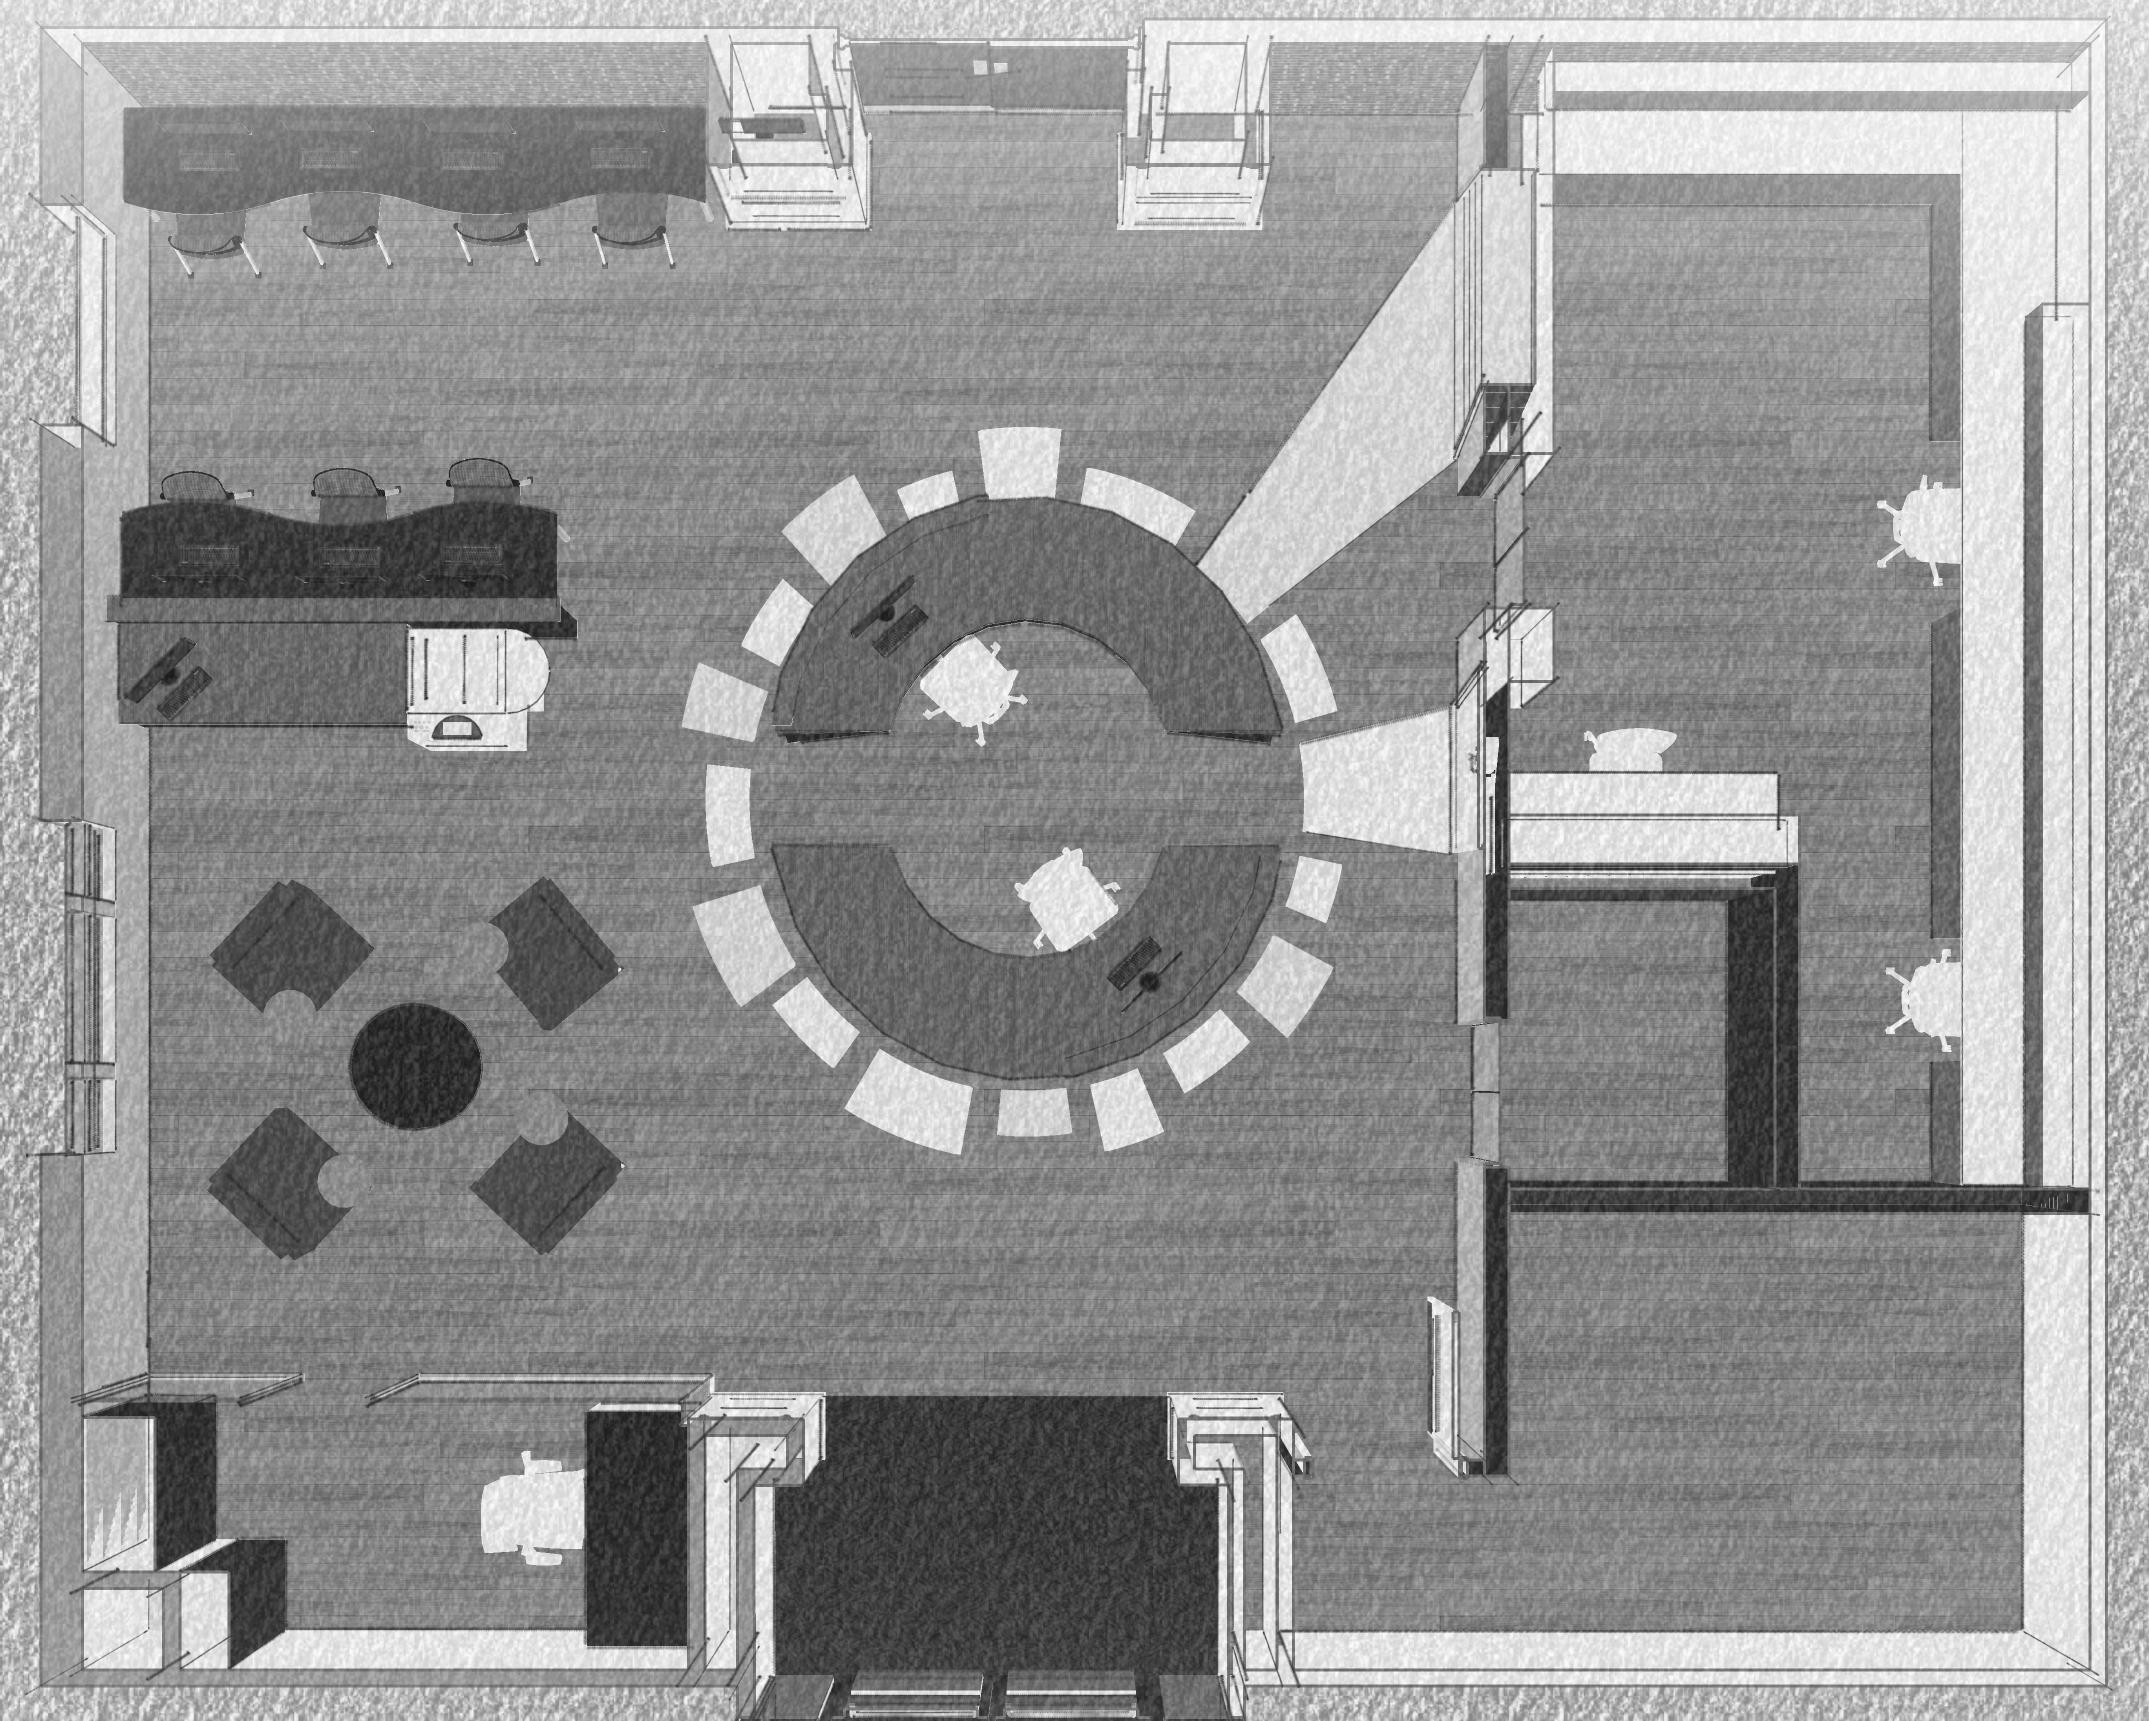 + Seymour Library - Lobby